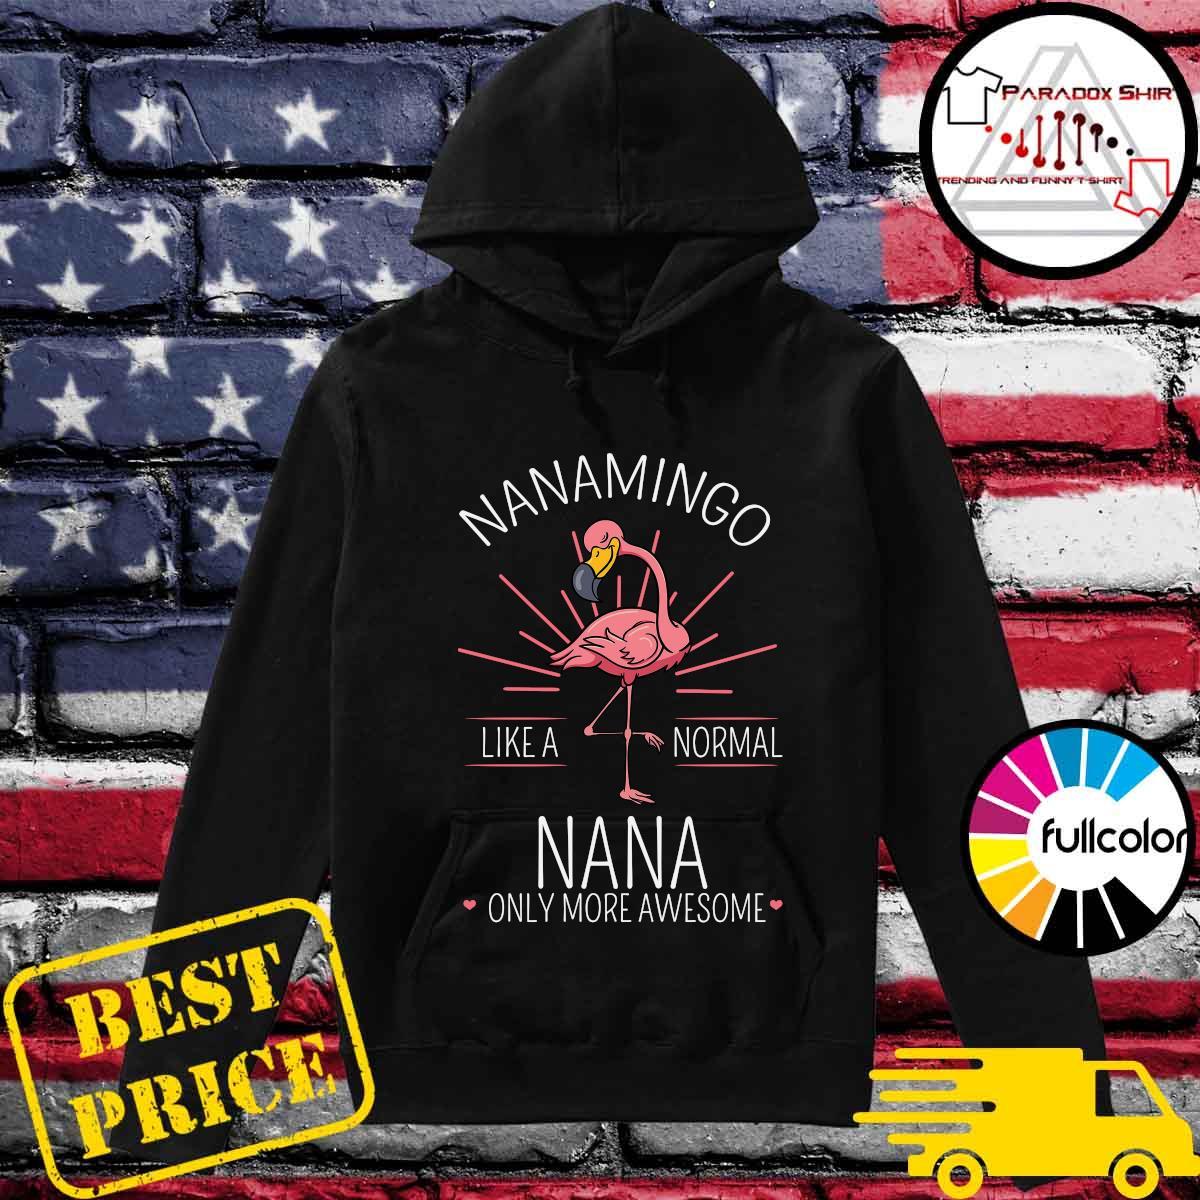 Flamingo Nanamingo Like A Normal Nana Only More Awesome Shirt Hoodie